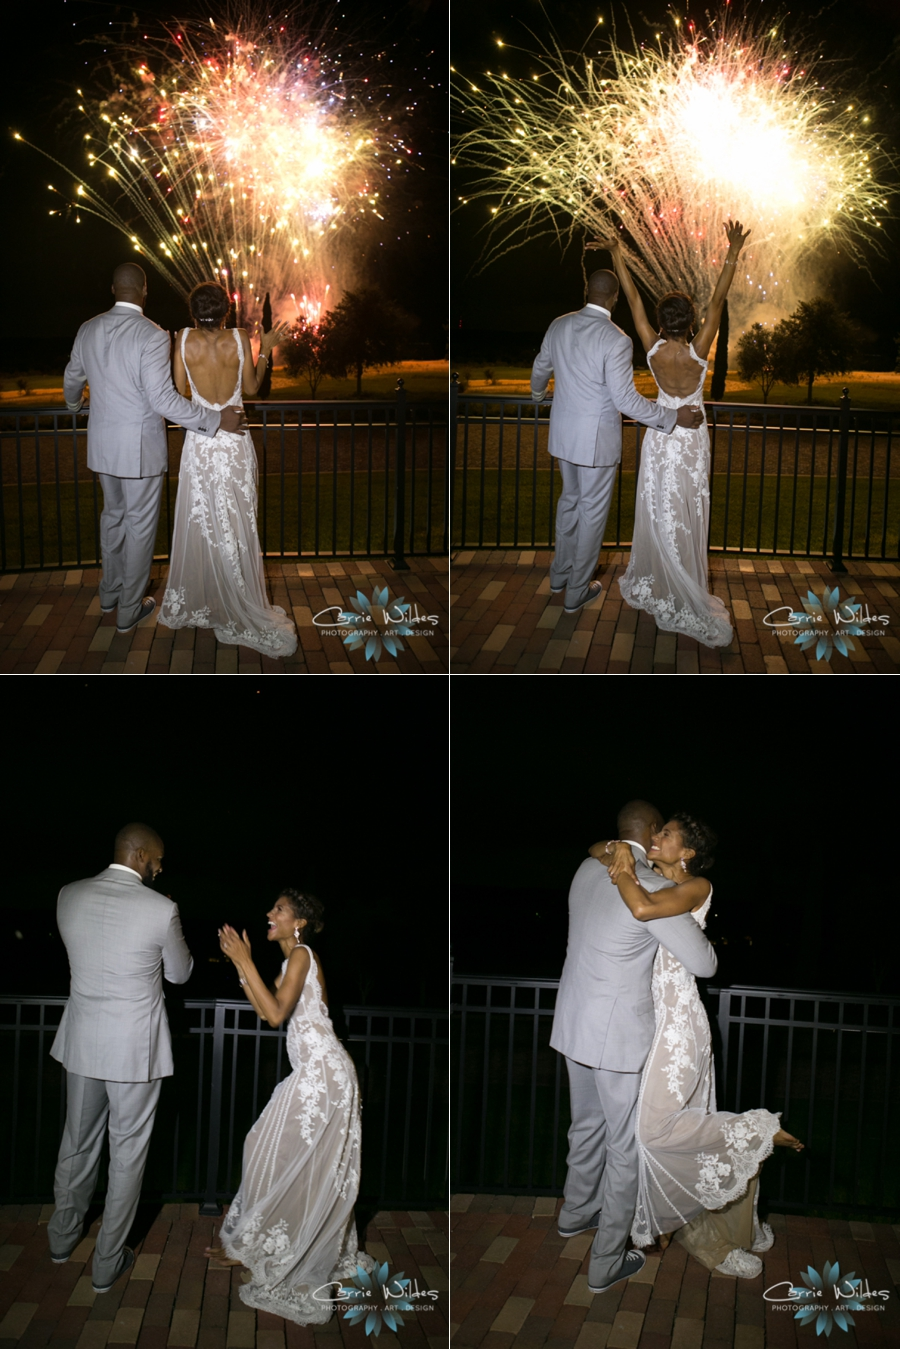 8_14_15 Bella Collina Wedding Fireworks_0005.jpg